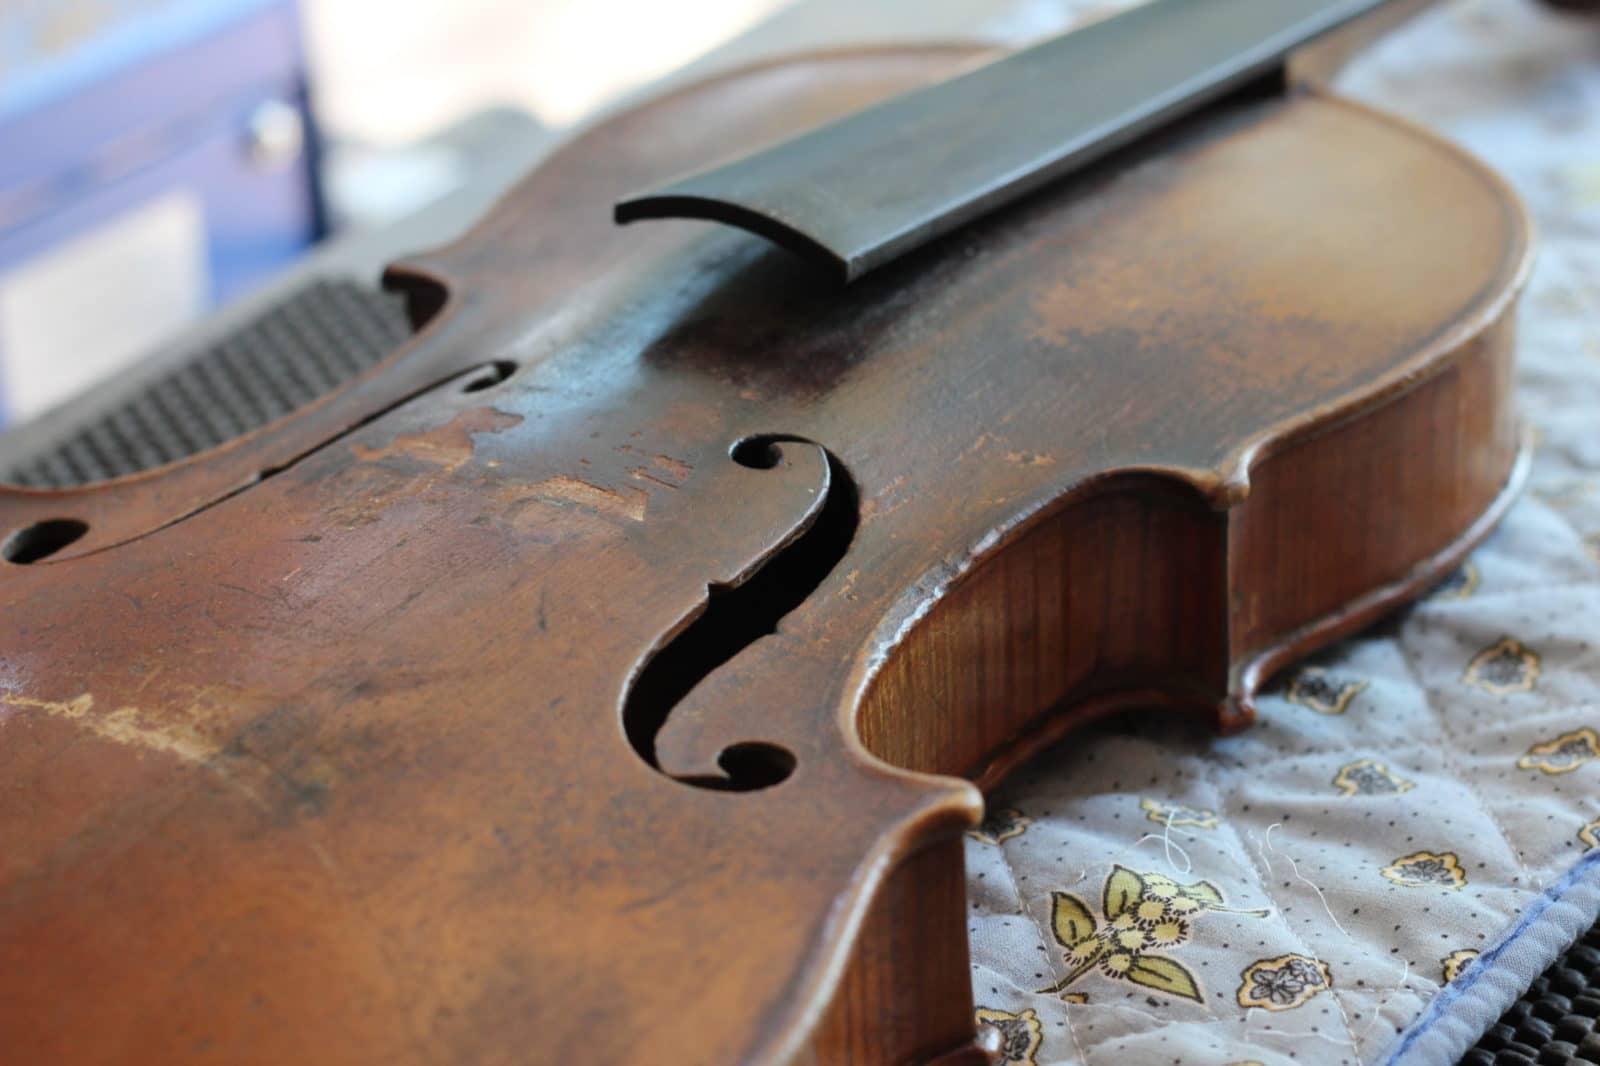 acheter son violon d 39 occasion guillaume kessler luthier. Black Bedroom Furniture Sets. Home Design Ideas